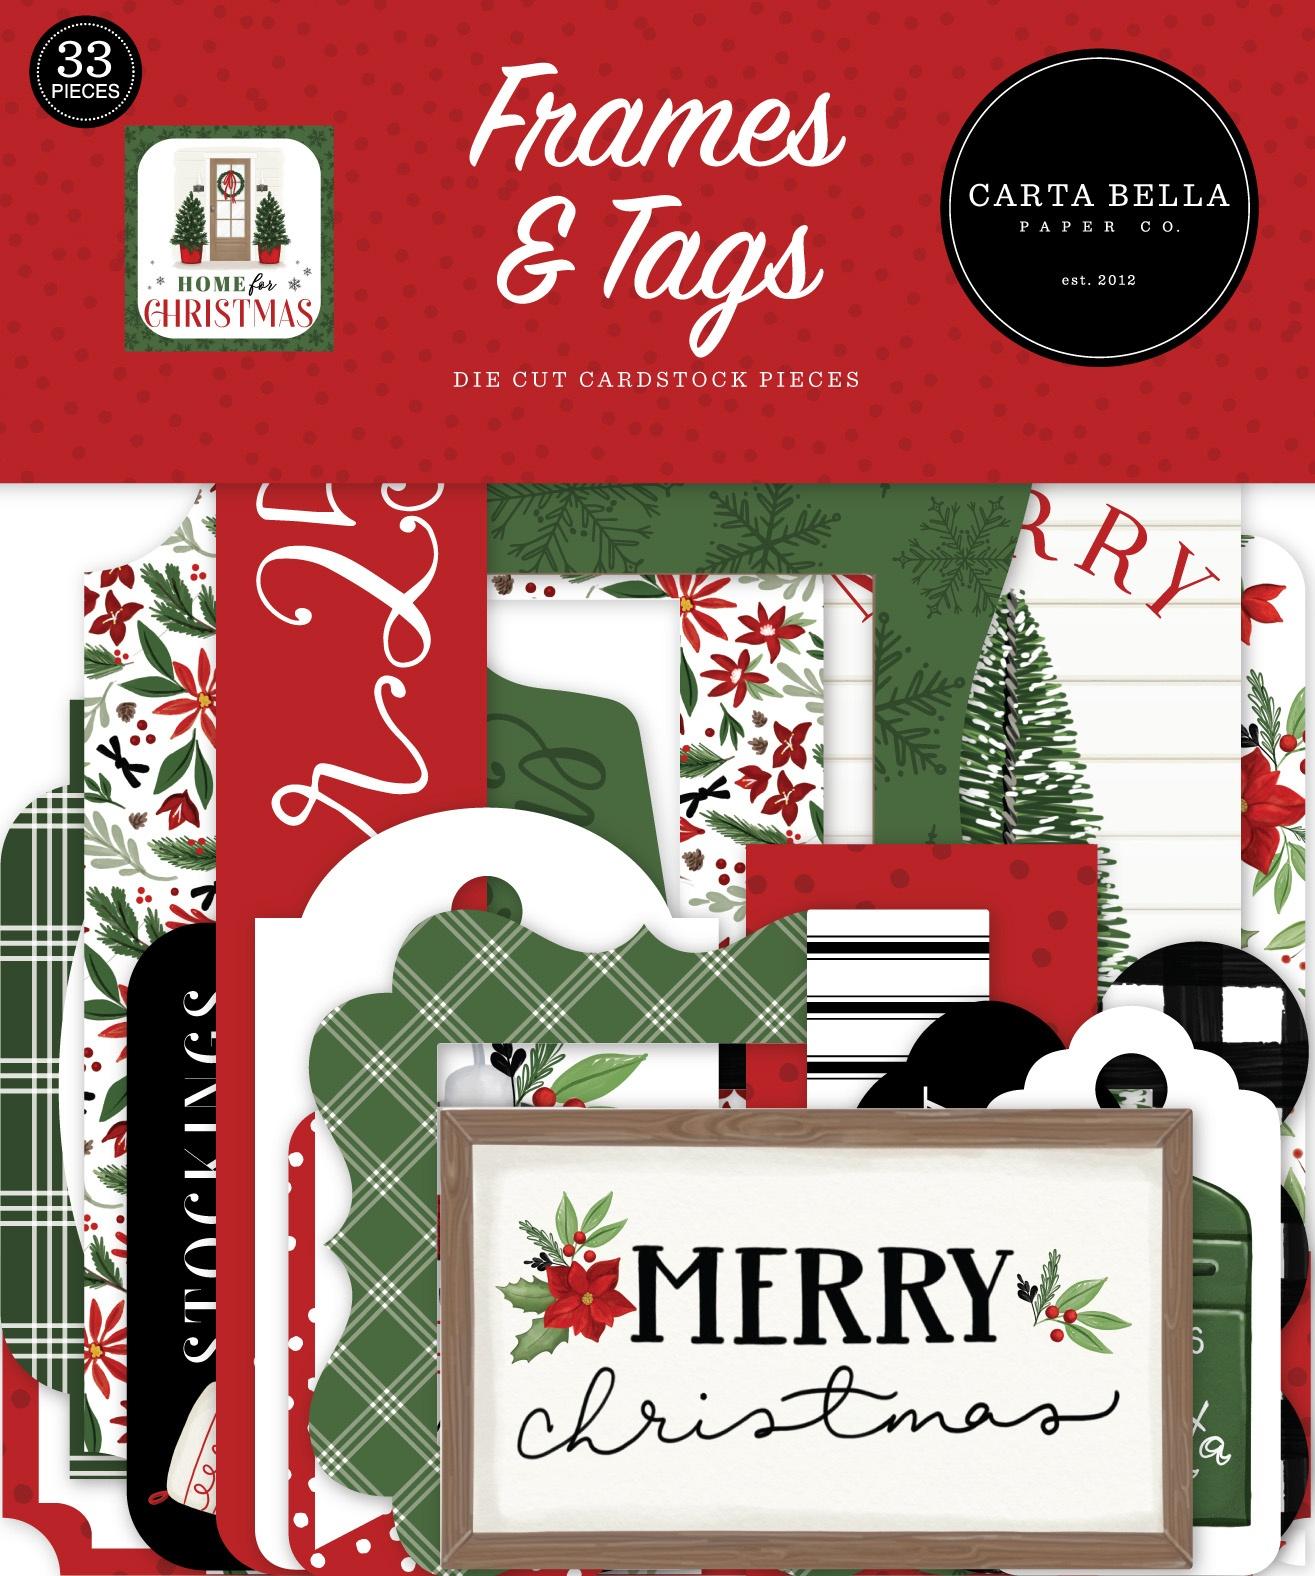 Carta Bella - Home For Christmas - Frames & Tags